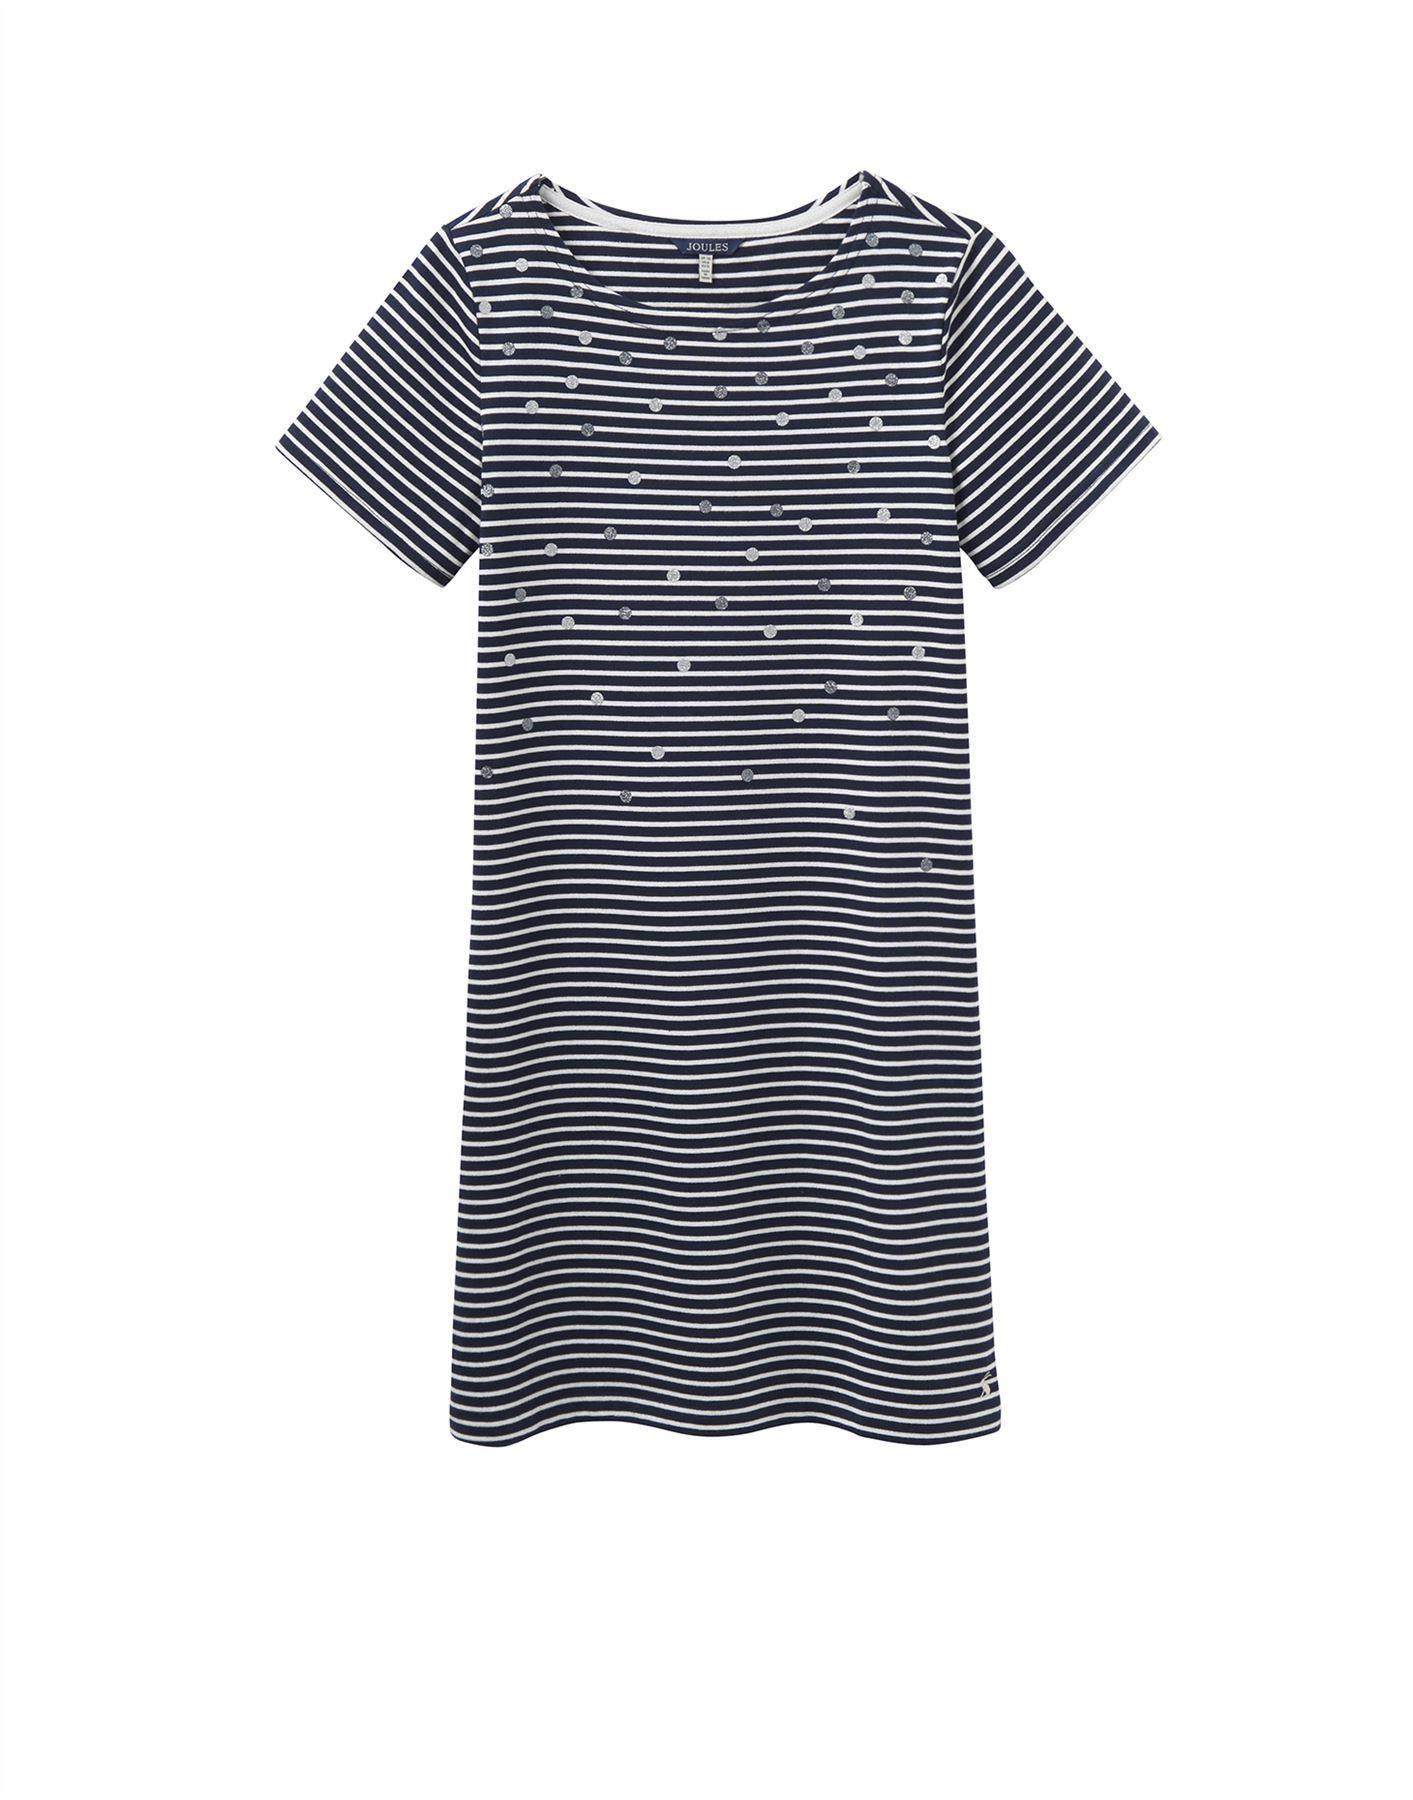 Joules Riviera Luxe Jersey T Shirt Dress Ebay